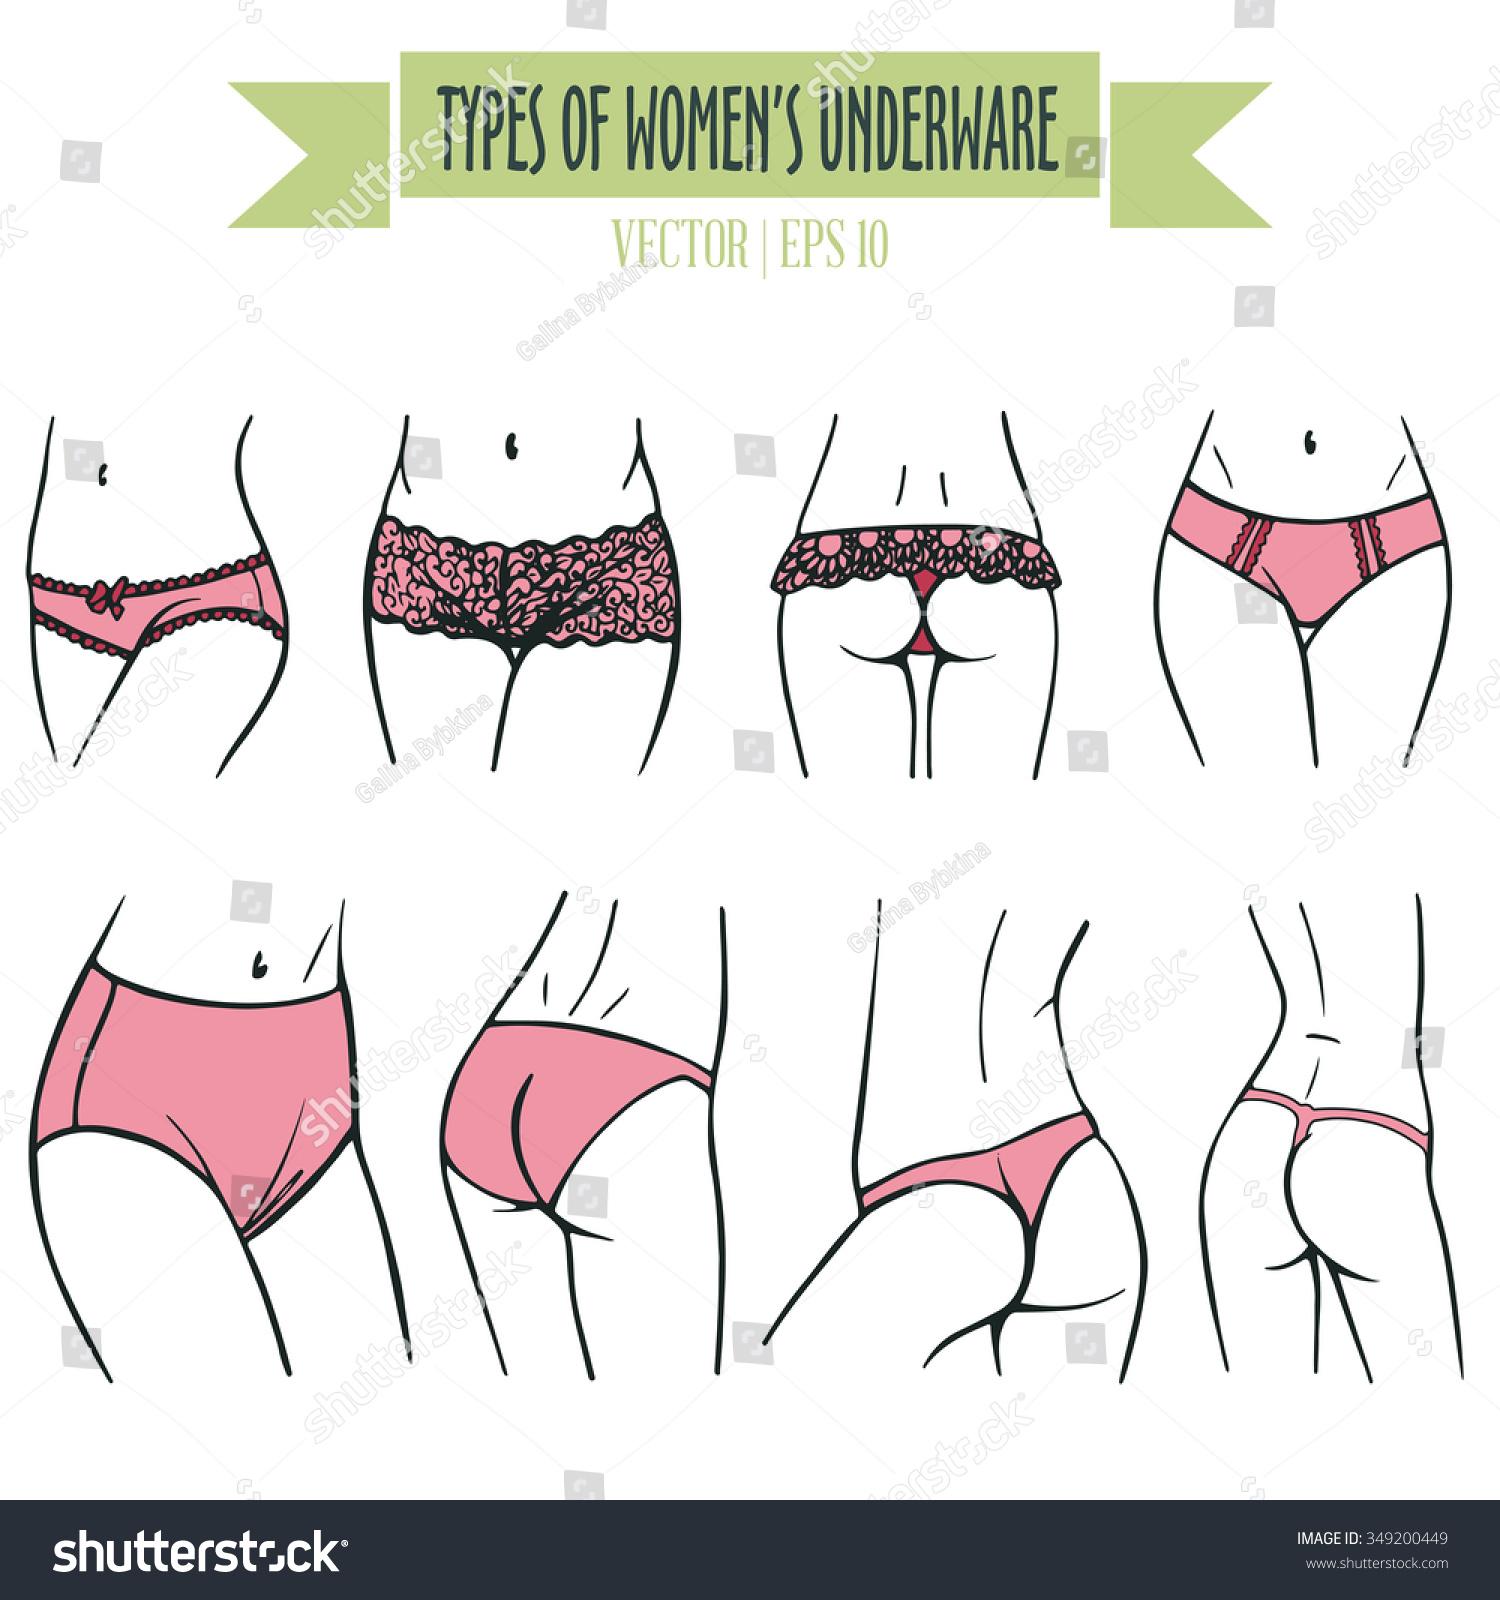 Hand Drawn Types Womens Underwear Vector Stock Vector ...